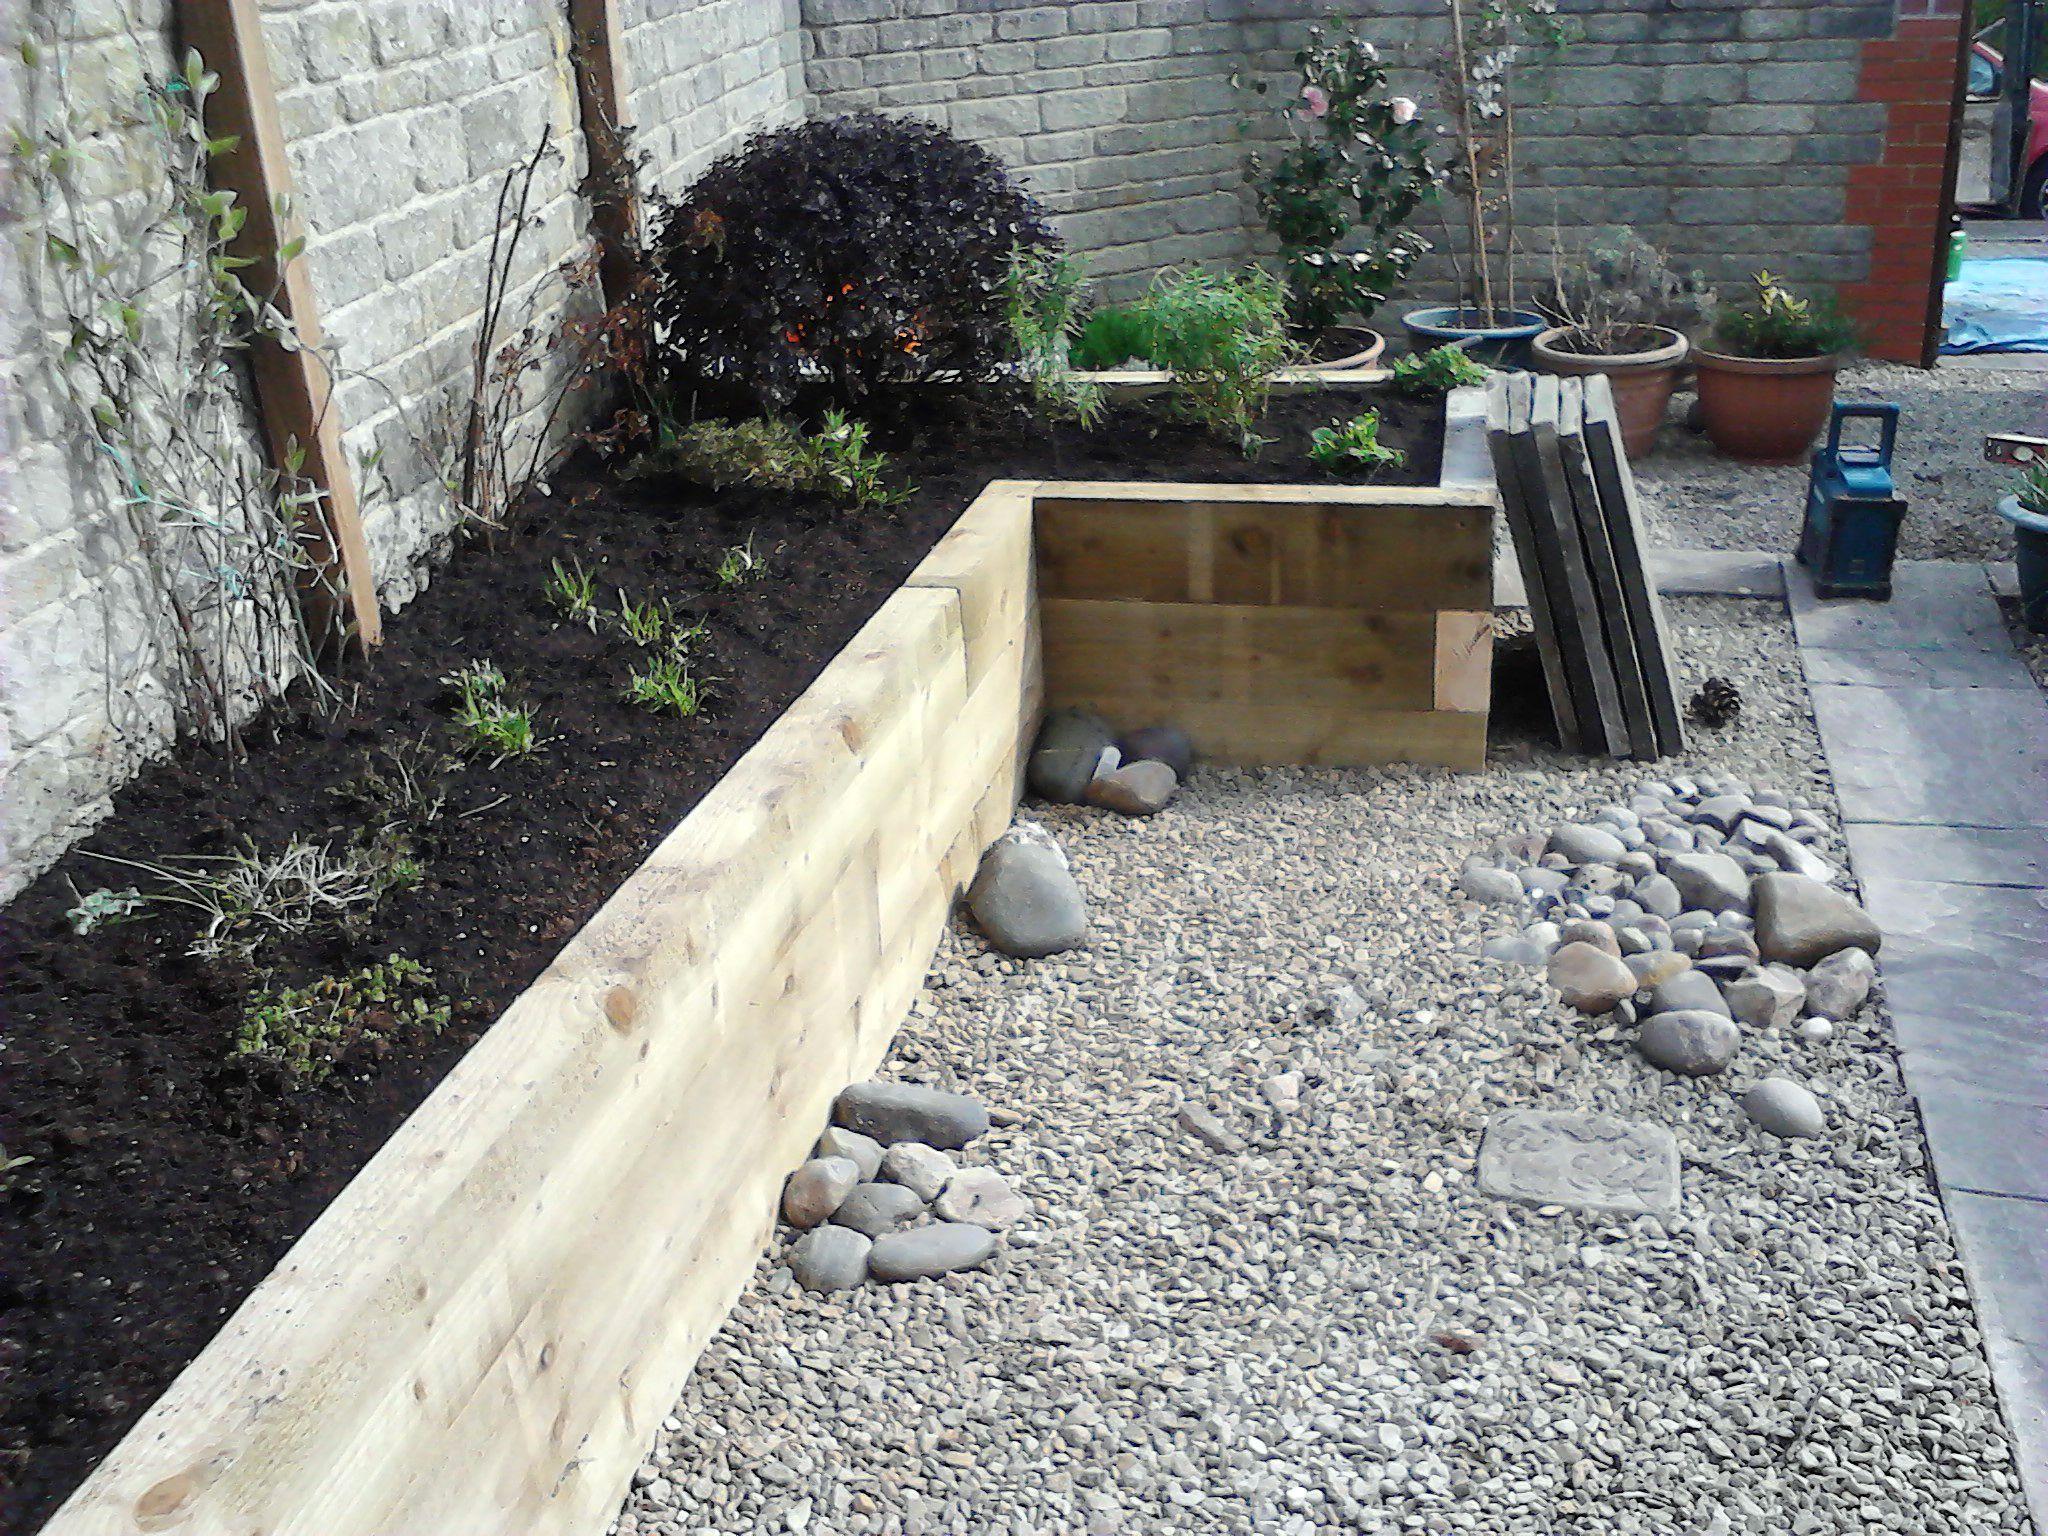 garden sleepers - Google Search   Garden landscaping ...